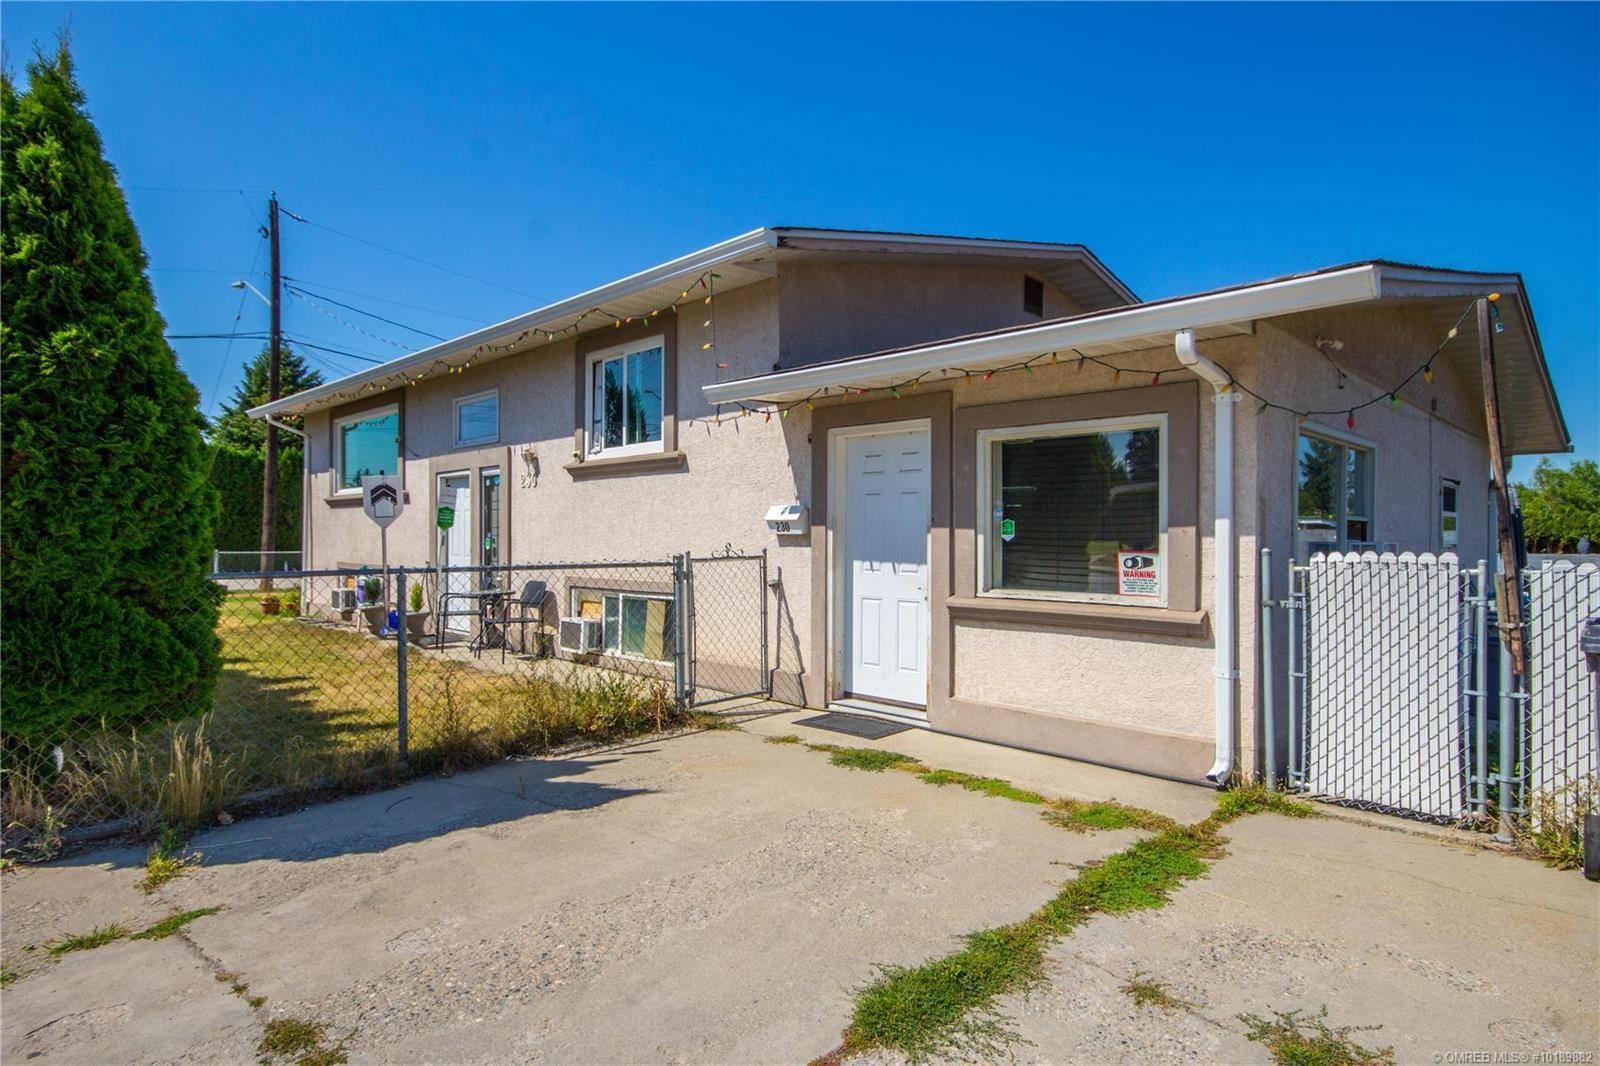 House for sale at 230 Leathead Rd Kelowna British Columbia - MLS: 10189882